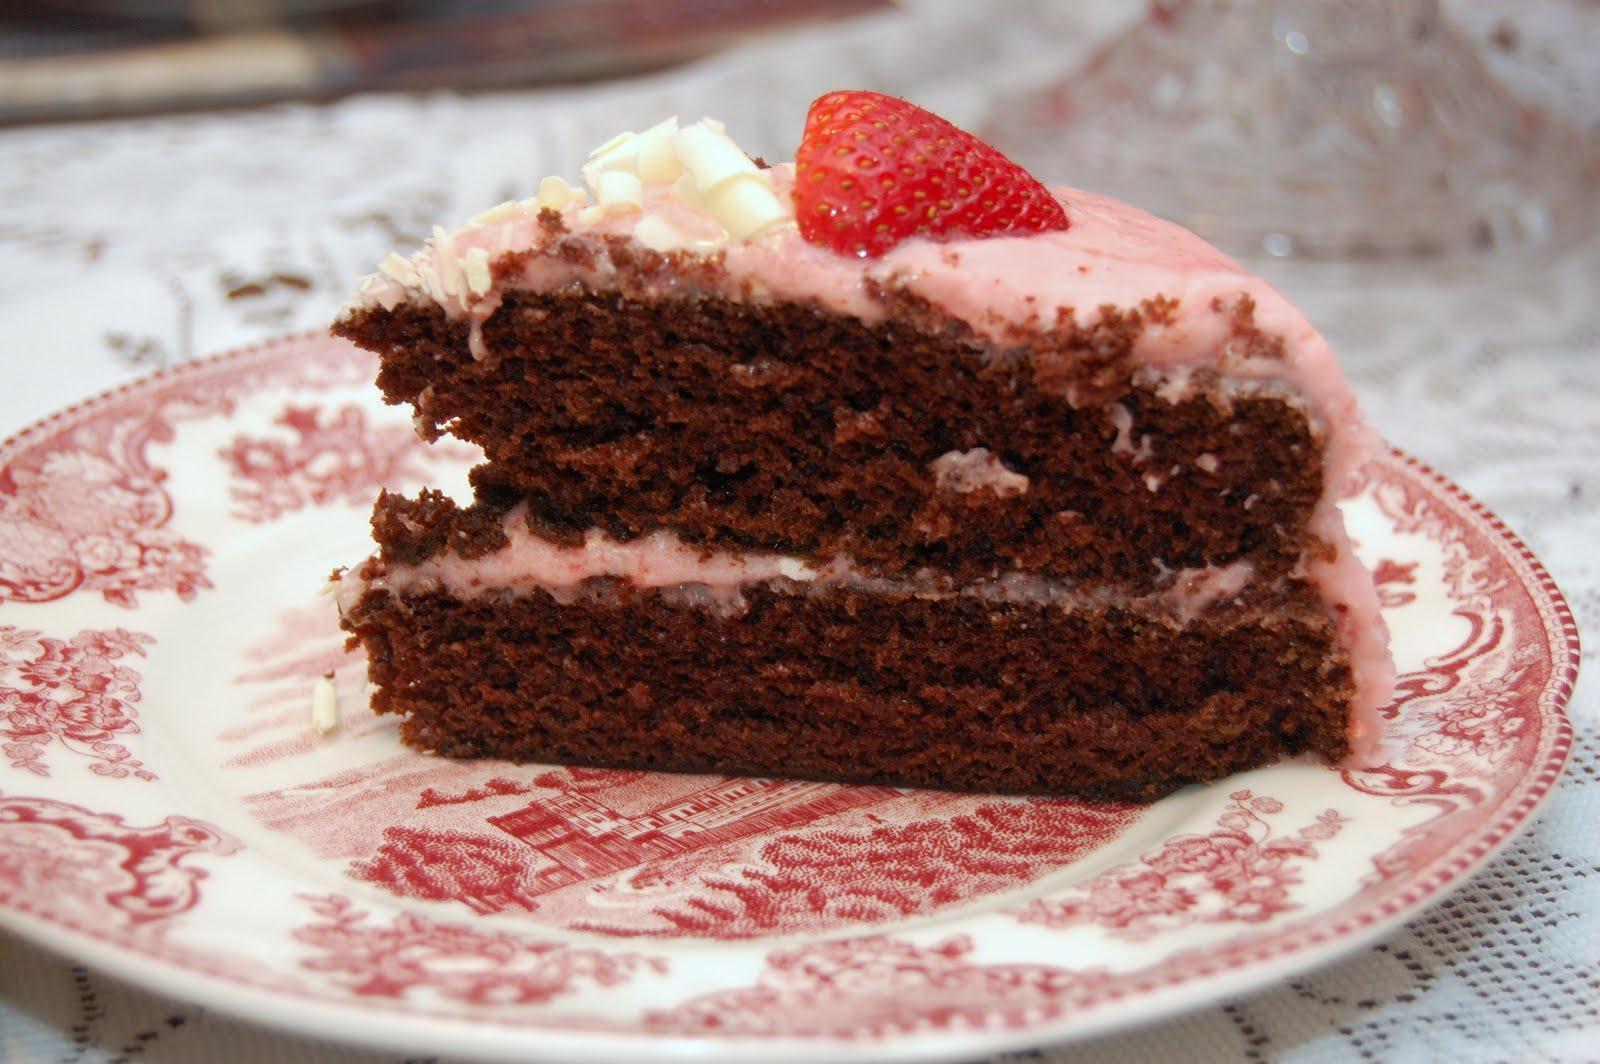 ... grazia: chocolate cake w/ strawberry buttercream: sissys birthday